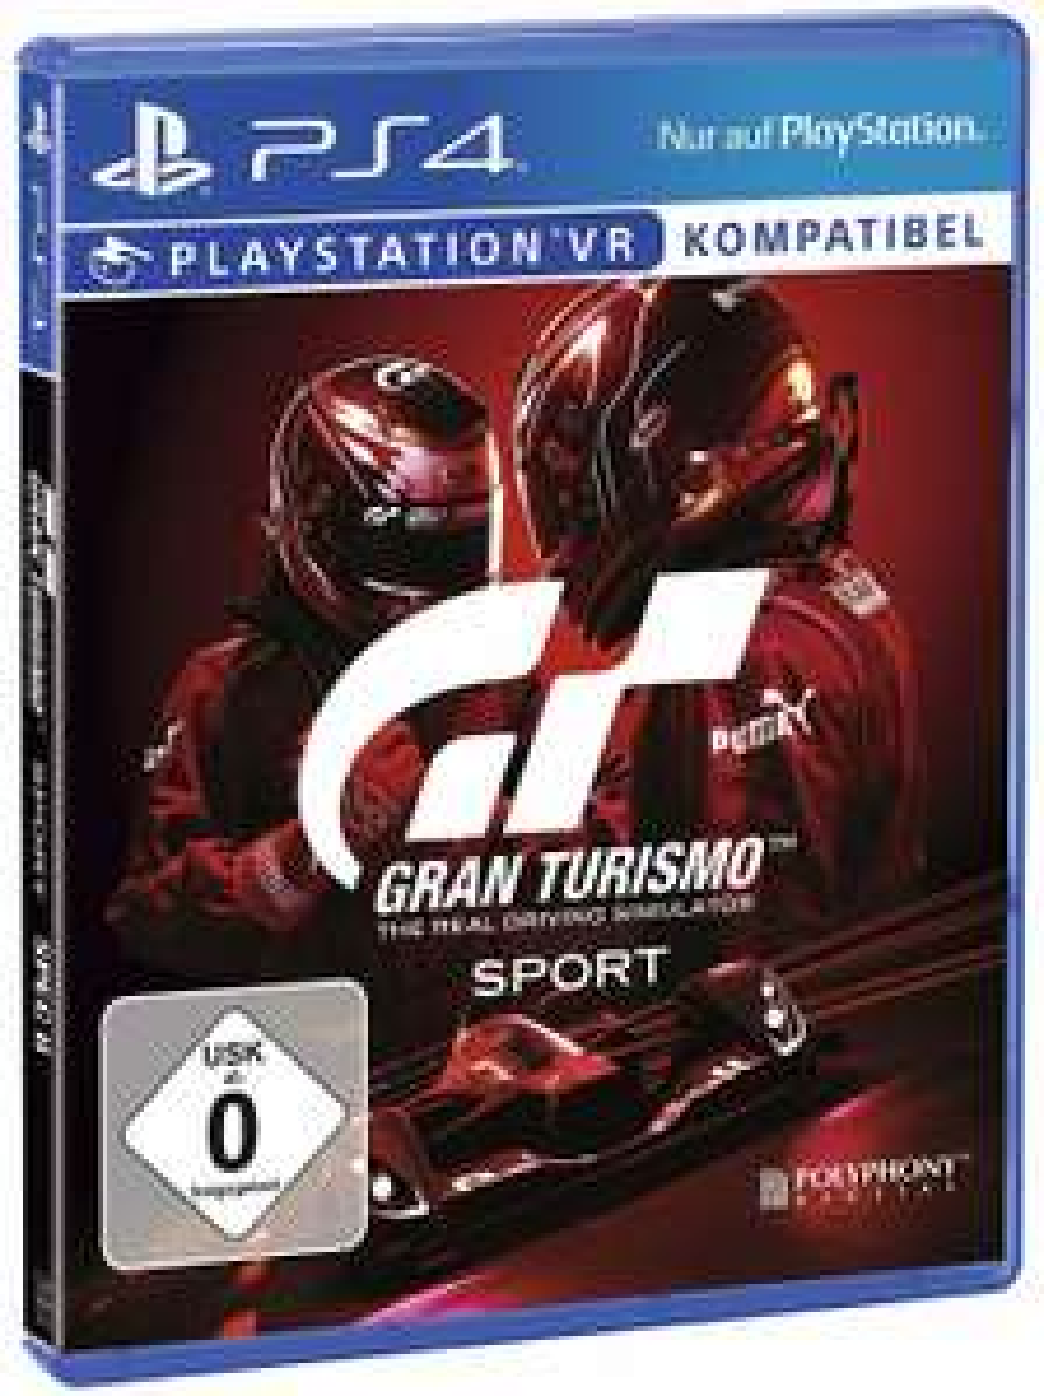 [Prime] Gran Turismo™ Sport – Spec(ial) Edition II (inkl. 2.5M Credits, Top 10-Fahrzeuge) - 19,99€   Standard Edition für 14,99€